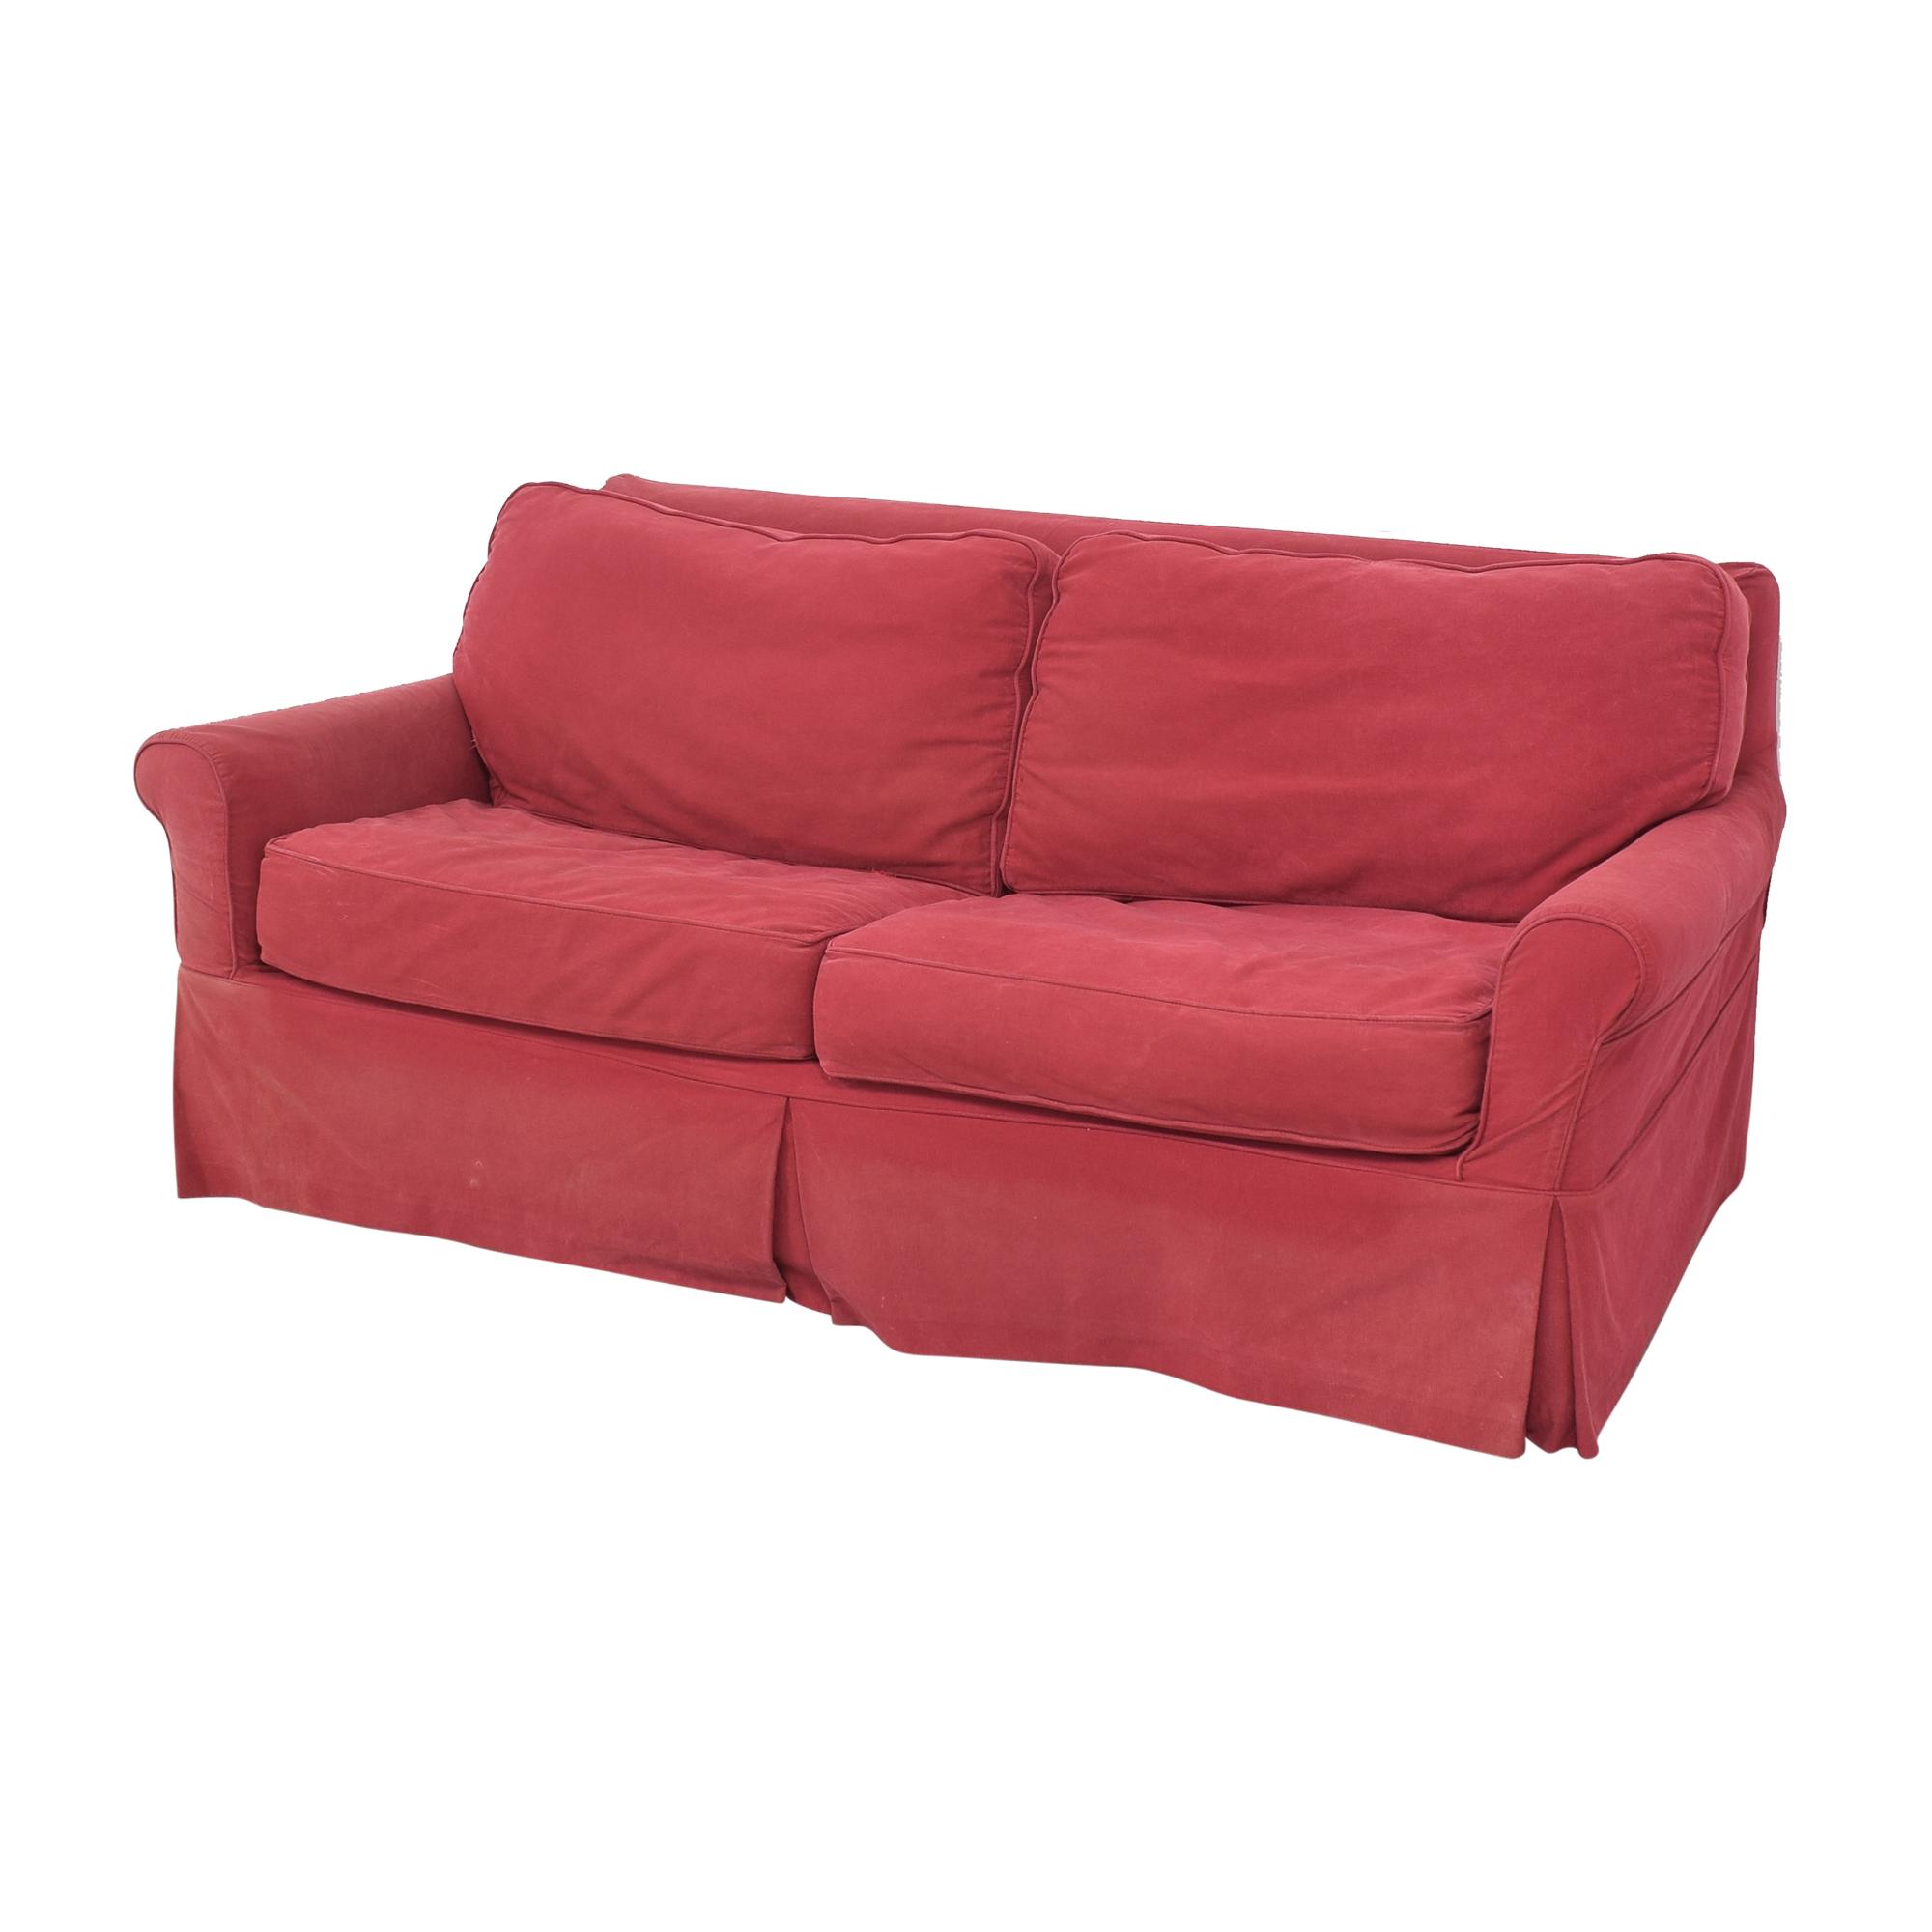 Crate & Barrel Crate & Barrel Roll Arm Slipcovered Sleeper Sofa ct